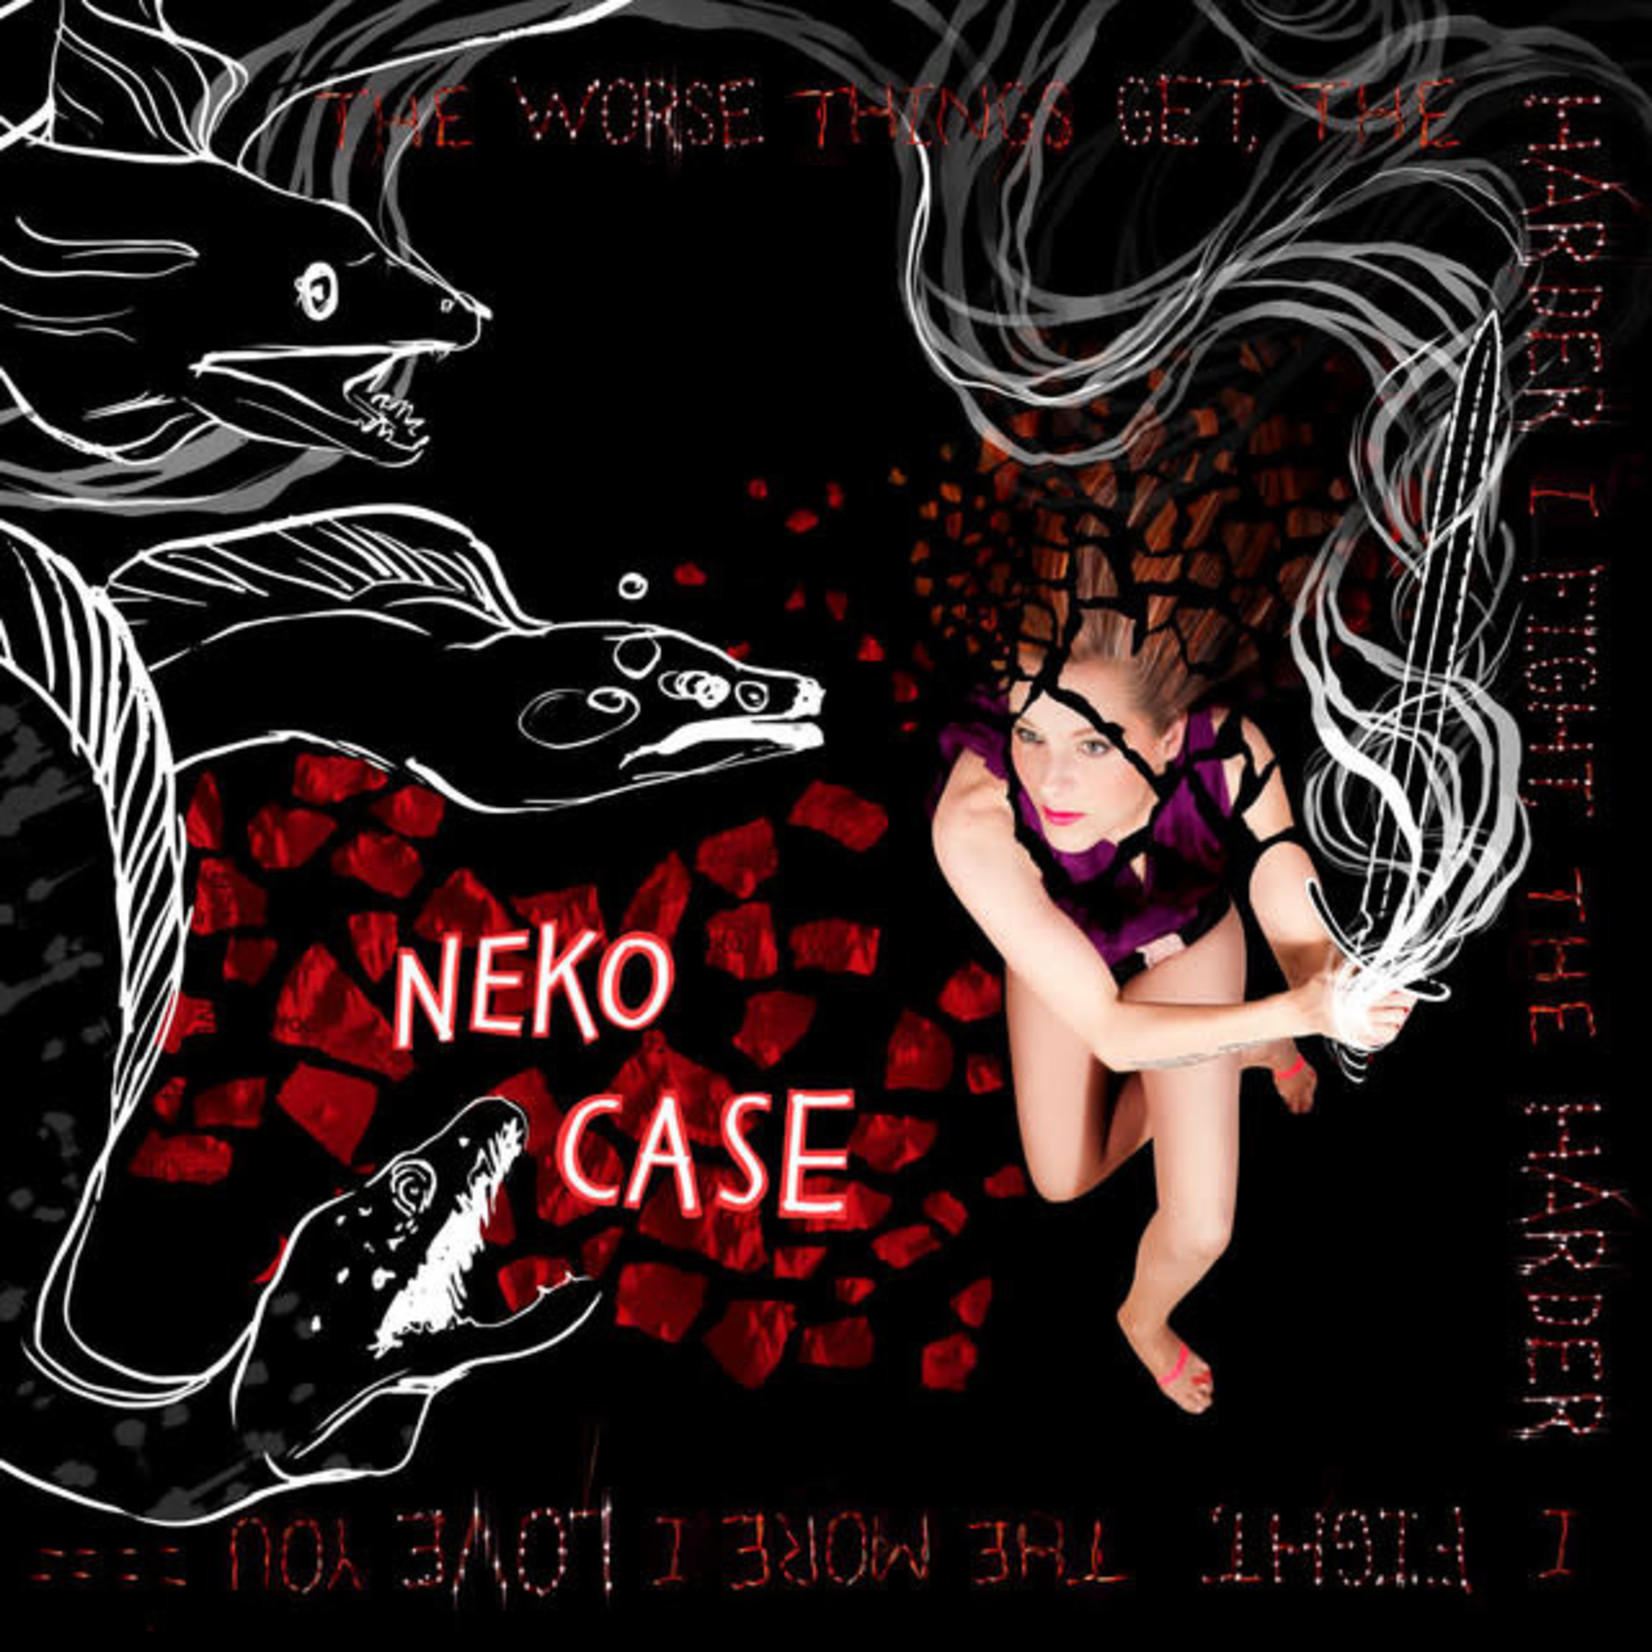 Vinyl Neko Case - The Worse Things Get $$